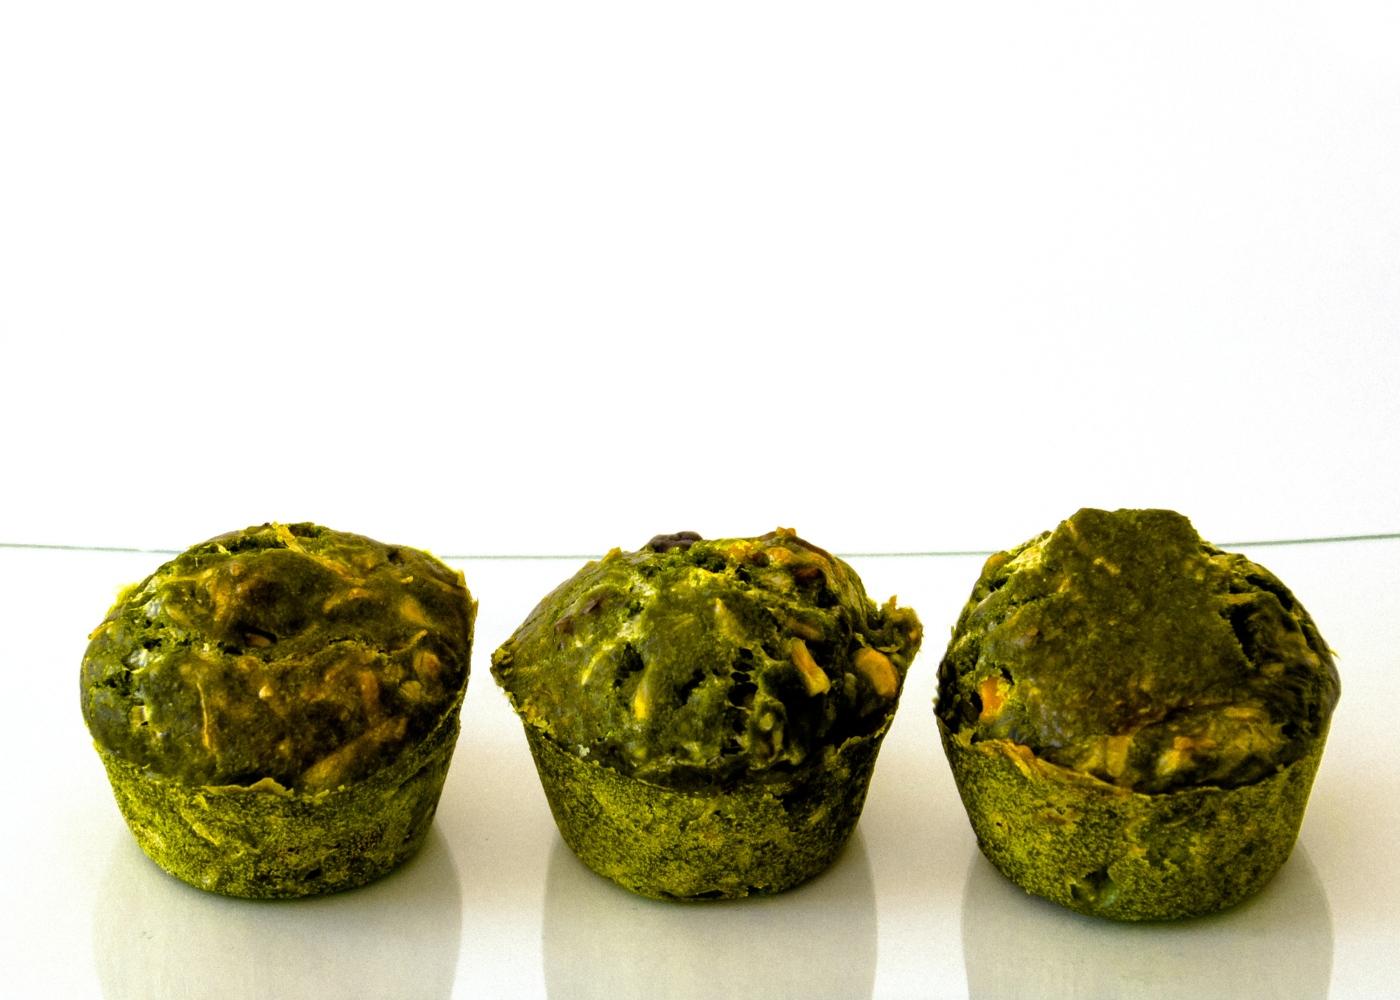 Receitas de snacks à base de hortícolas: muffins de espinafres